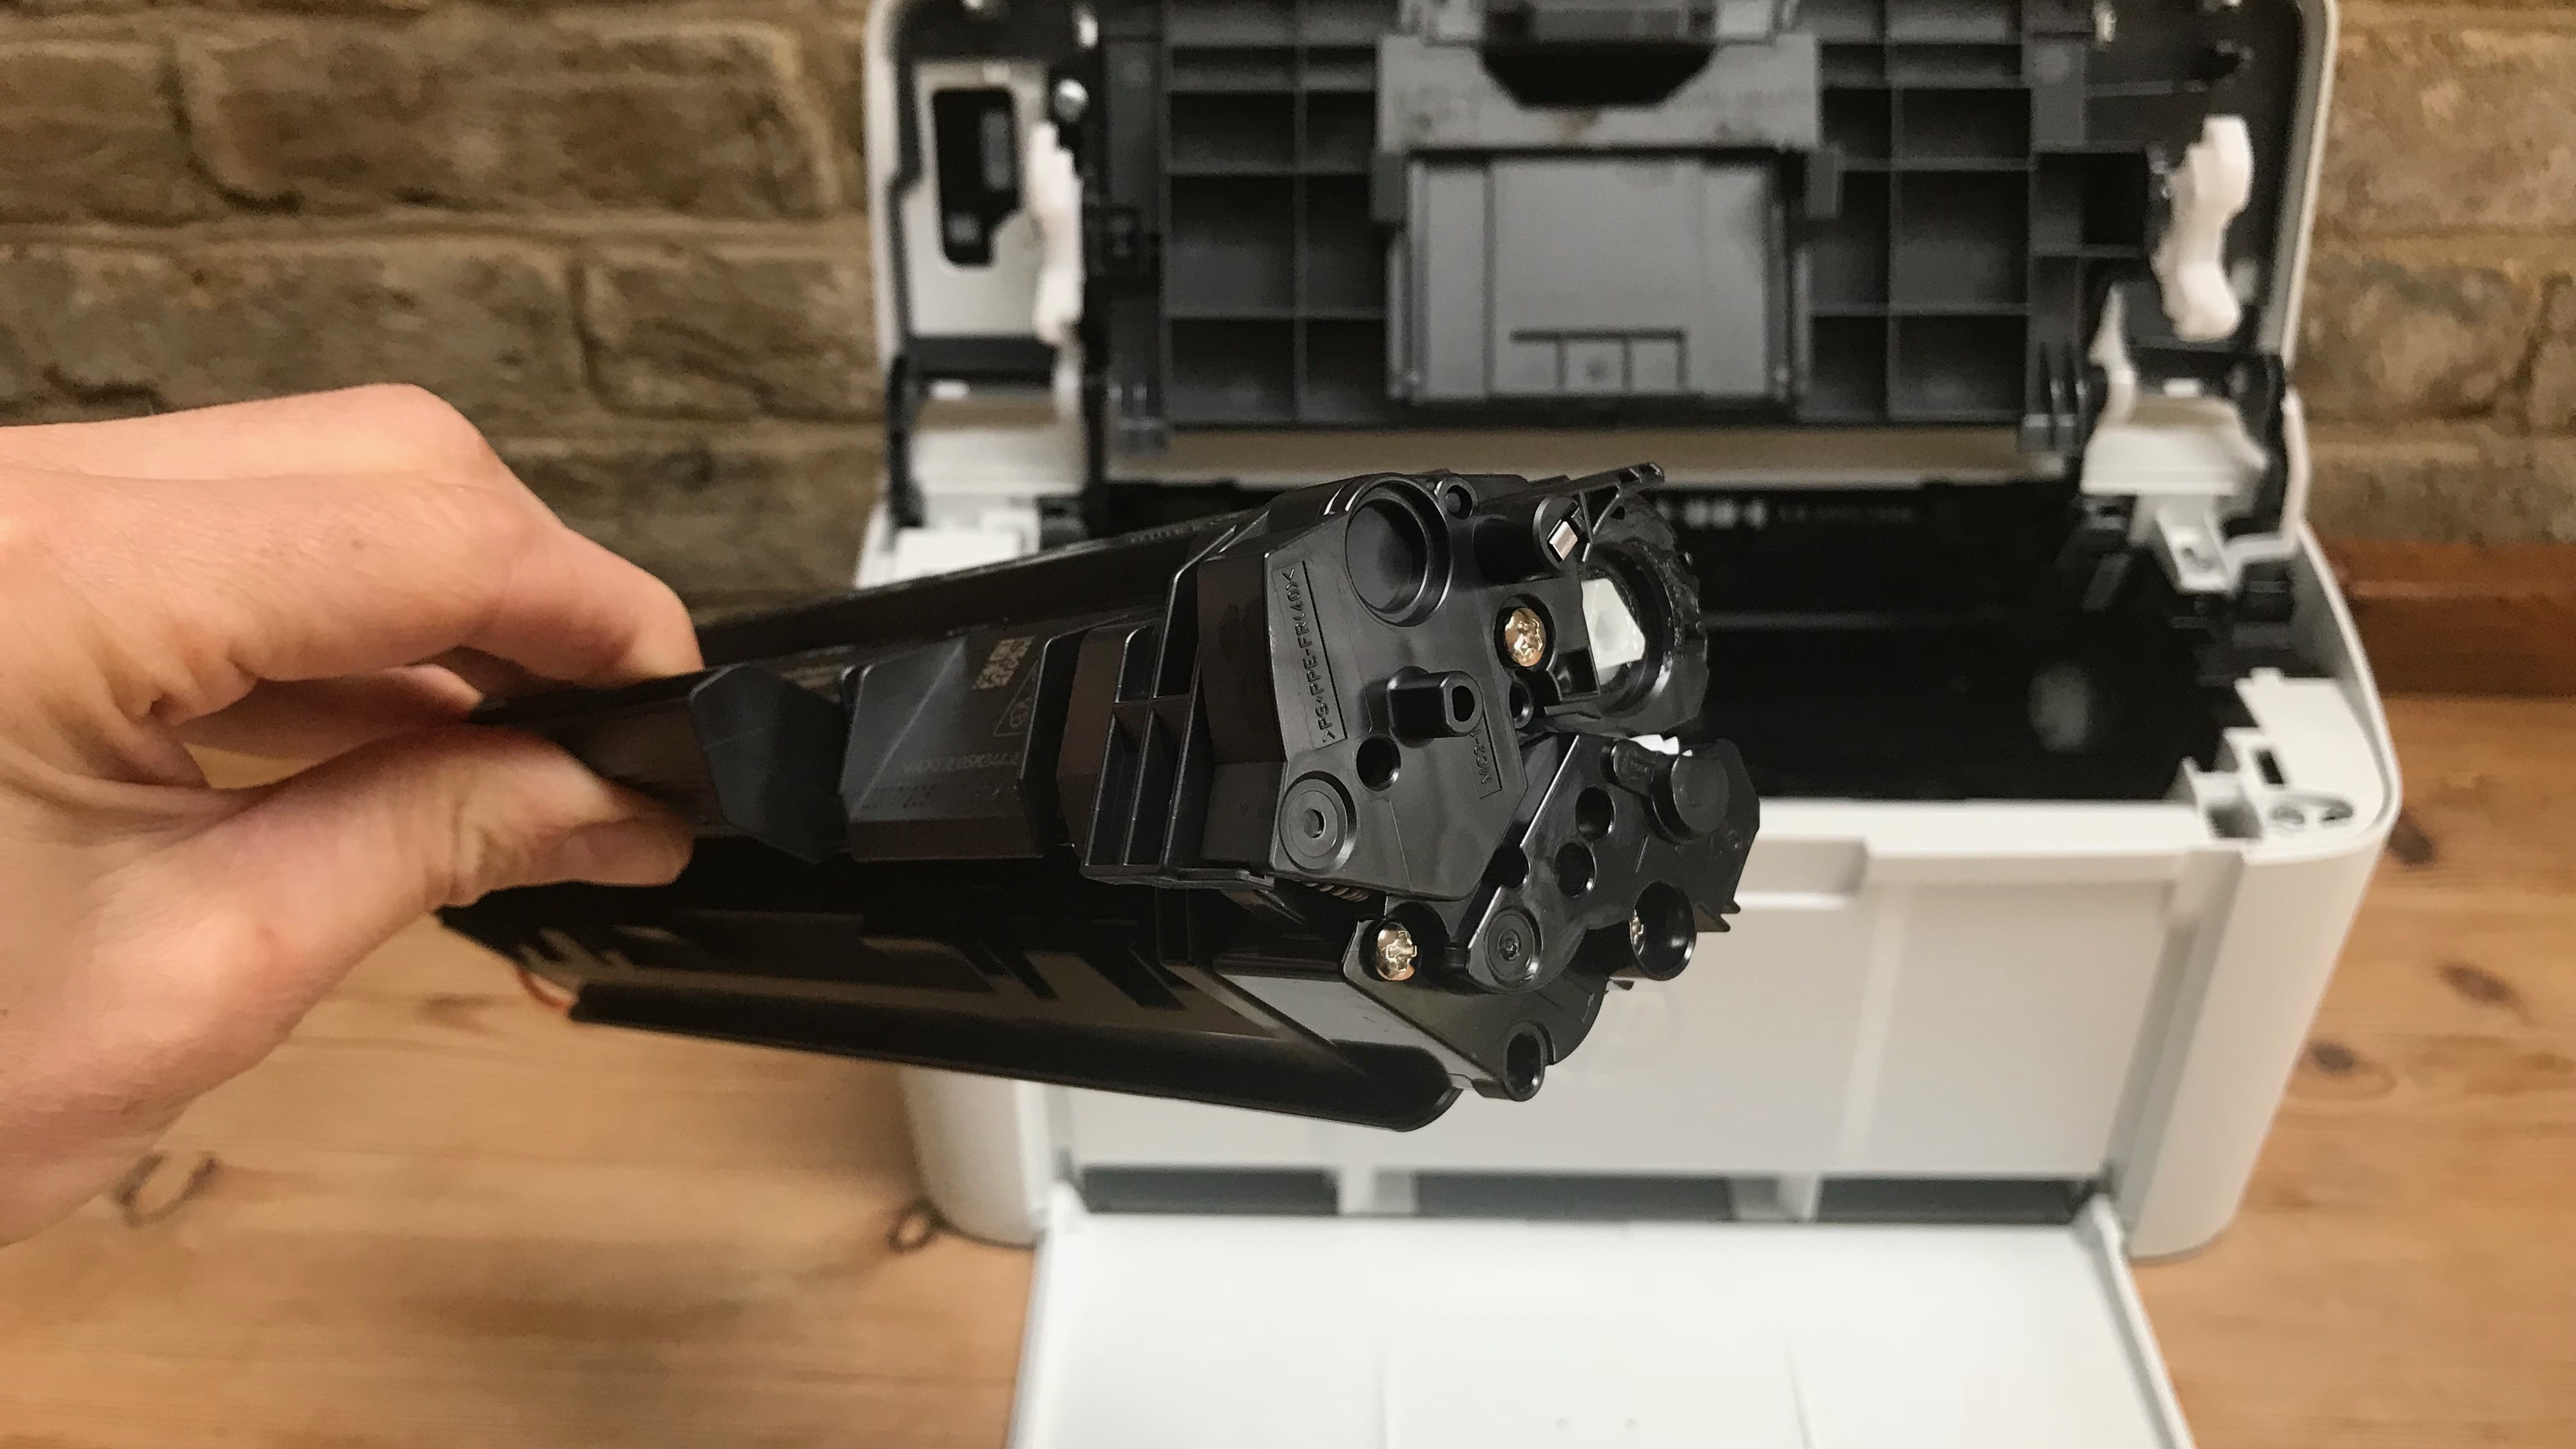 HP LaserJet Pro M15w toner cartridge